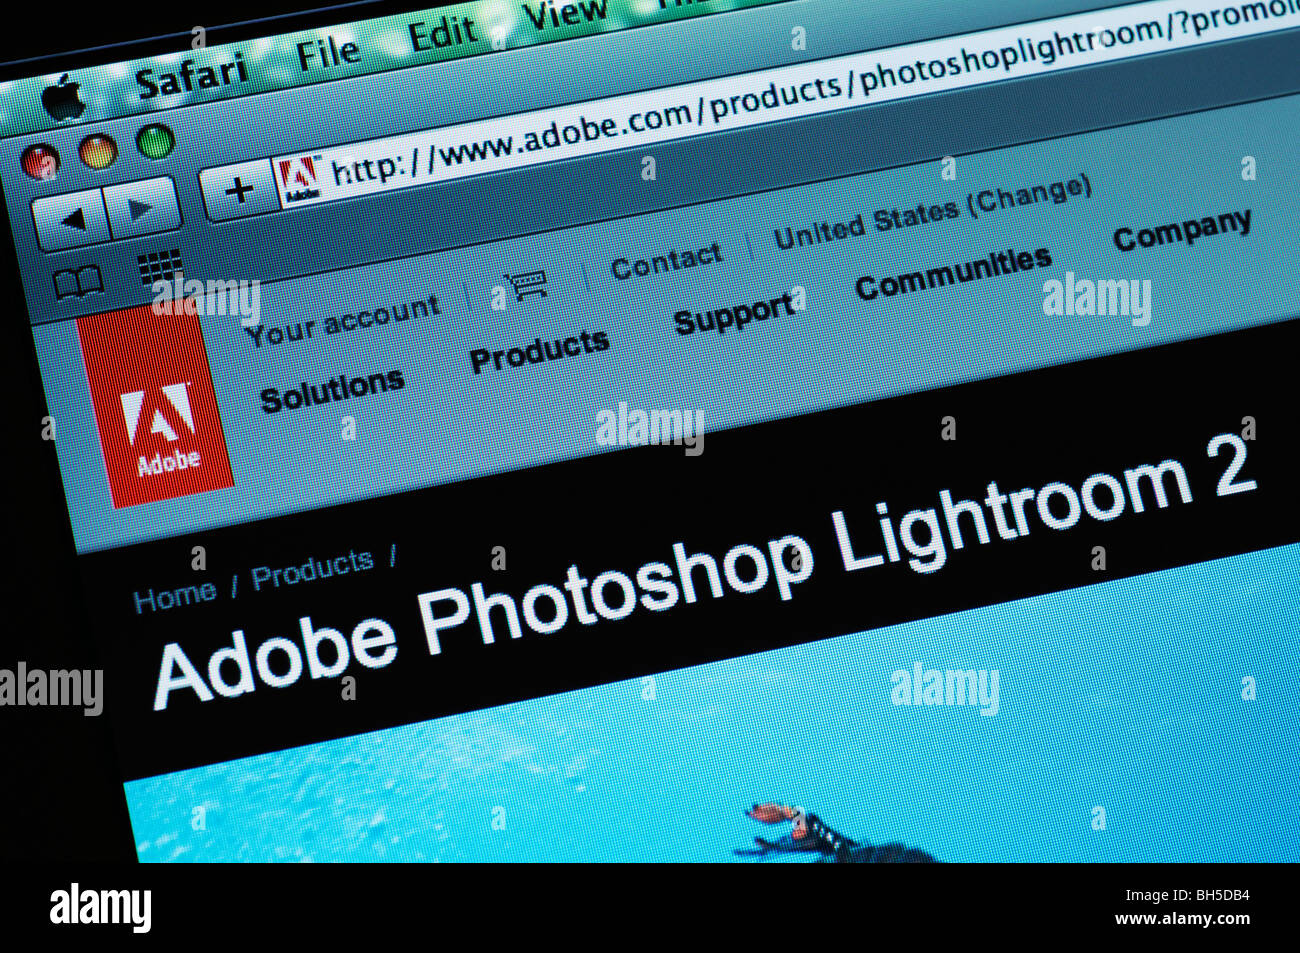 Adobe Photoshop Lightroom website - Stock Image